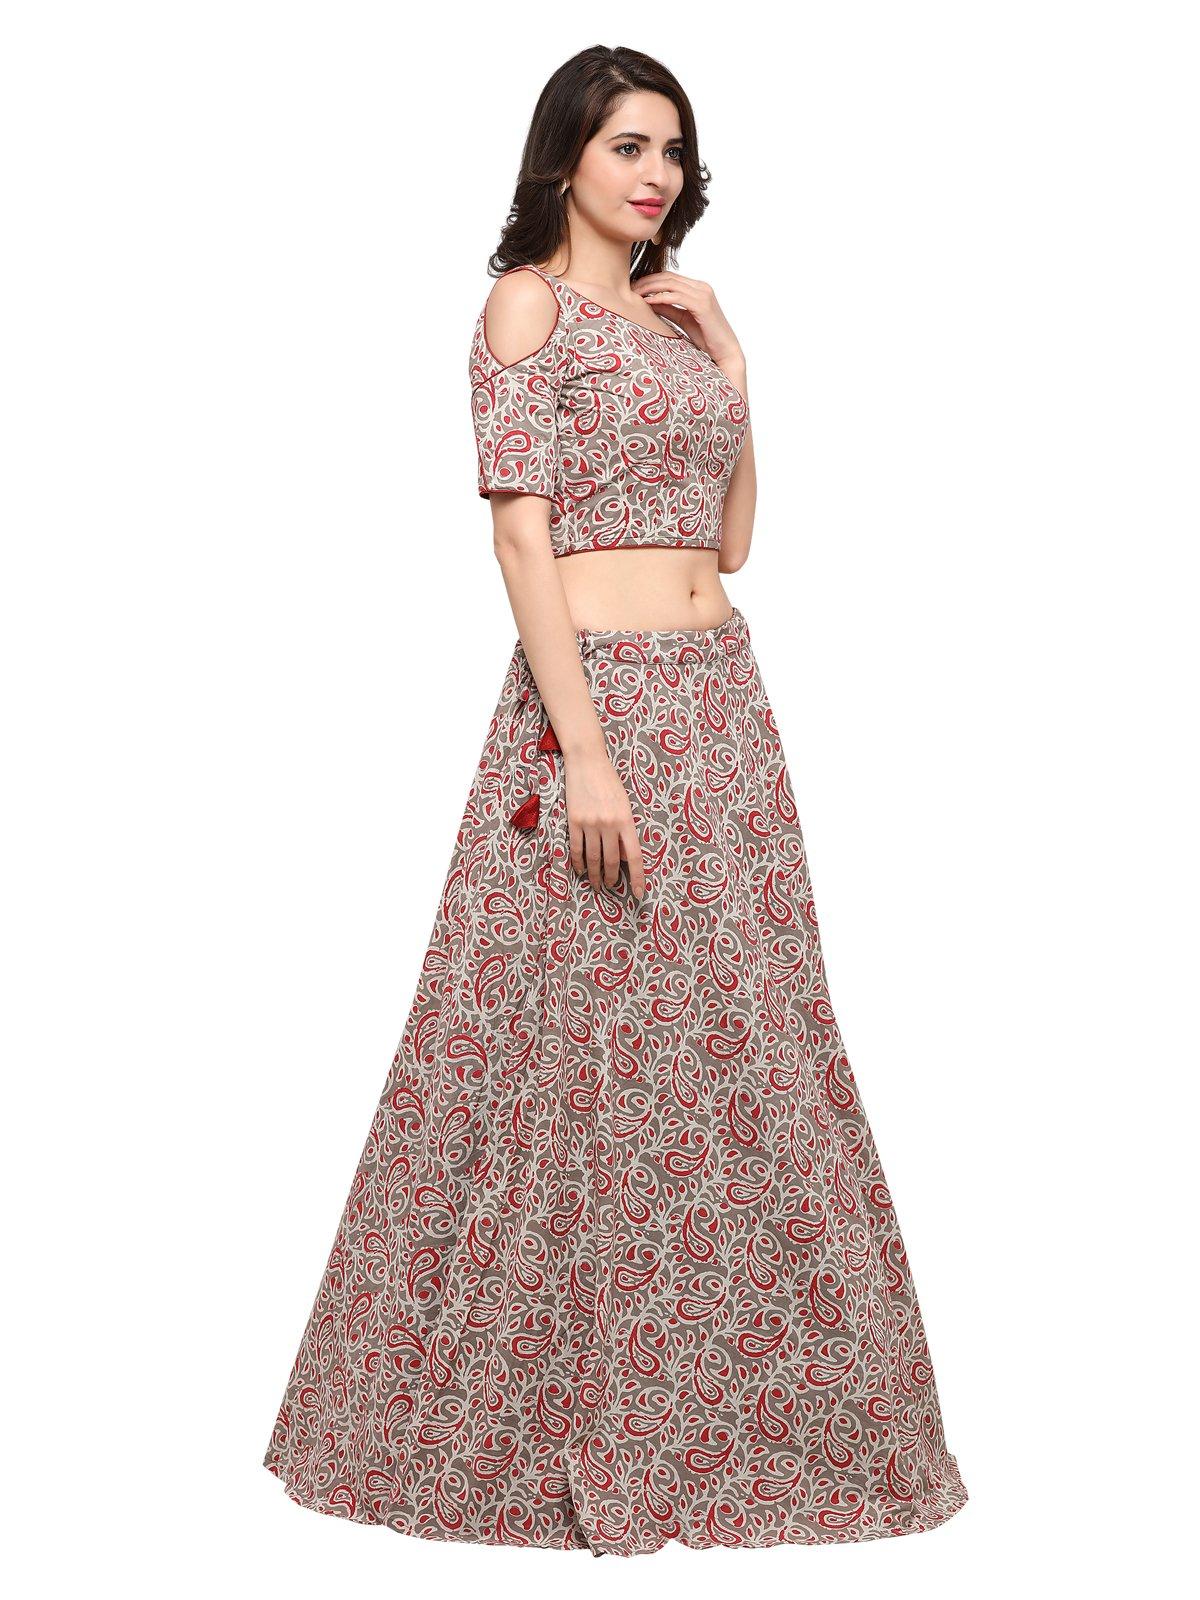 35c49ee42d Sunshine Ecommerce Women's Cotton Lahenga Choli Set - lali mix india